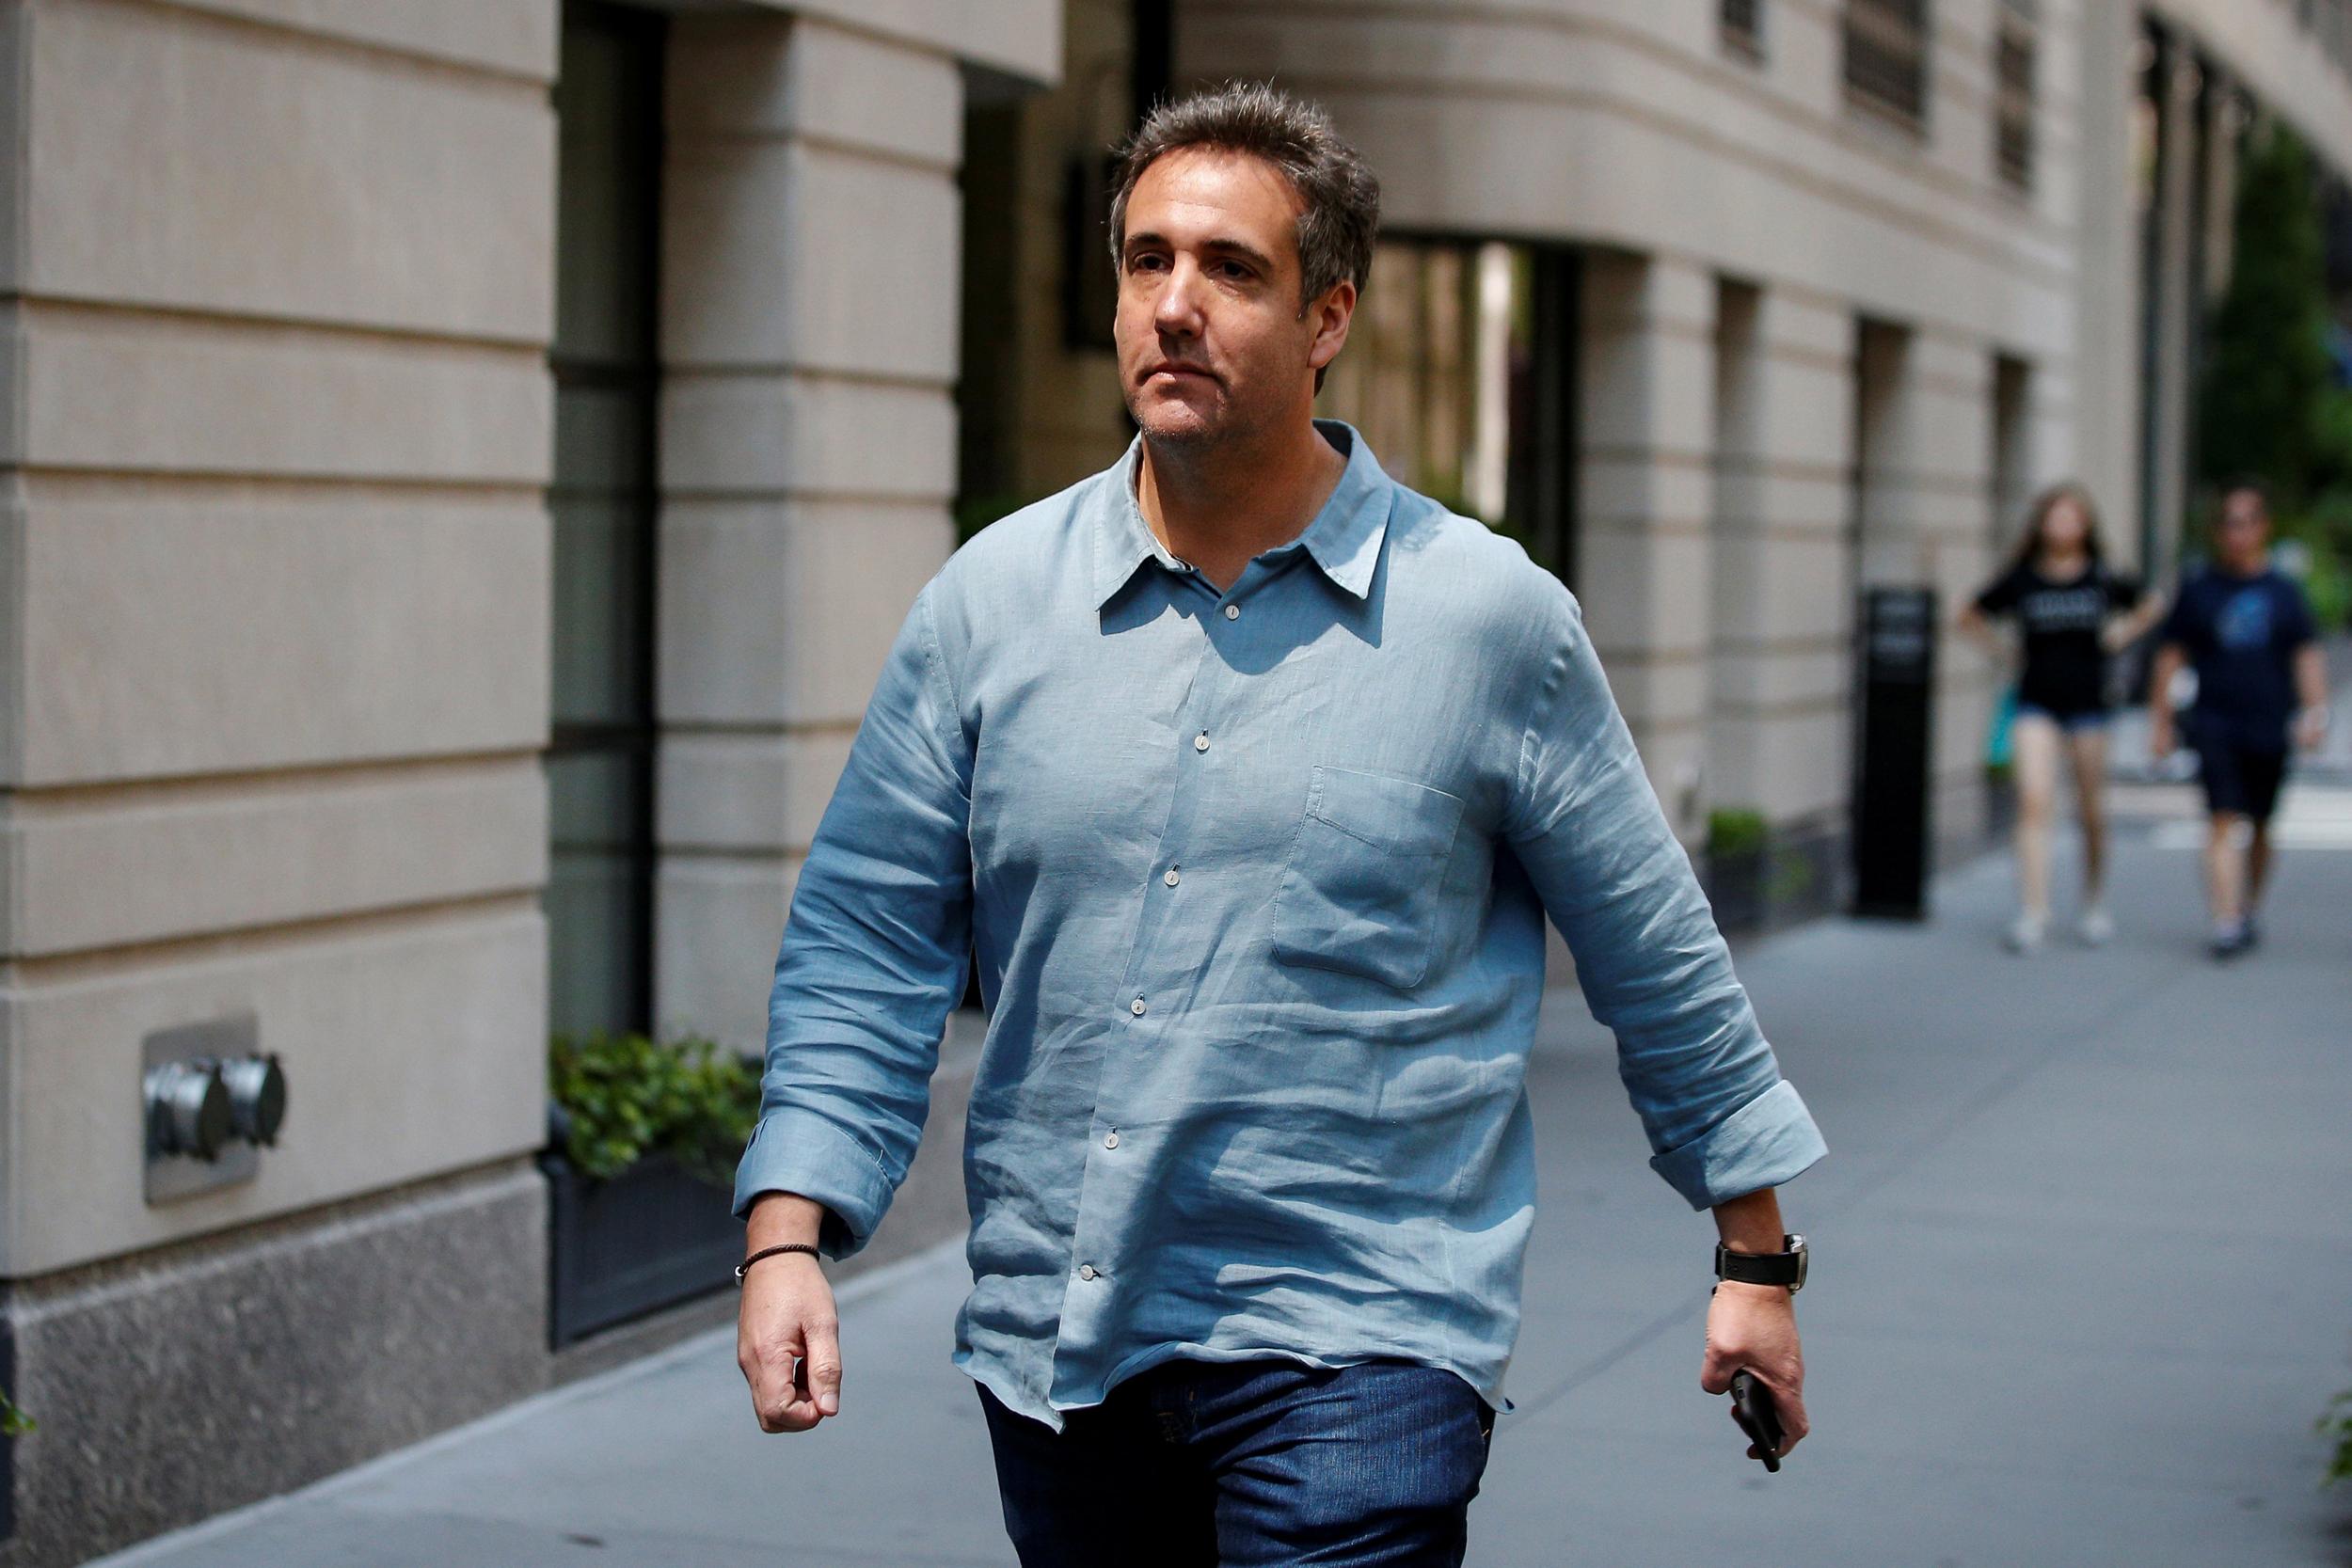 Ex-Trump lawyer Michael Cohen reaches plea deal with prosecutors